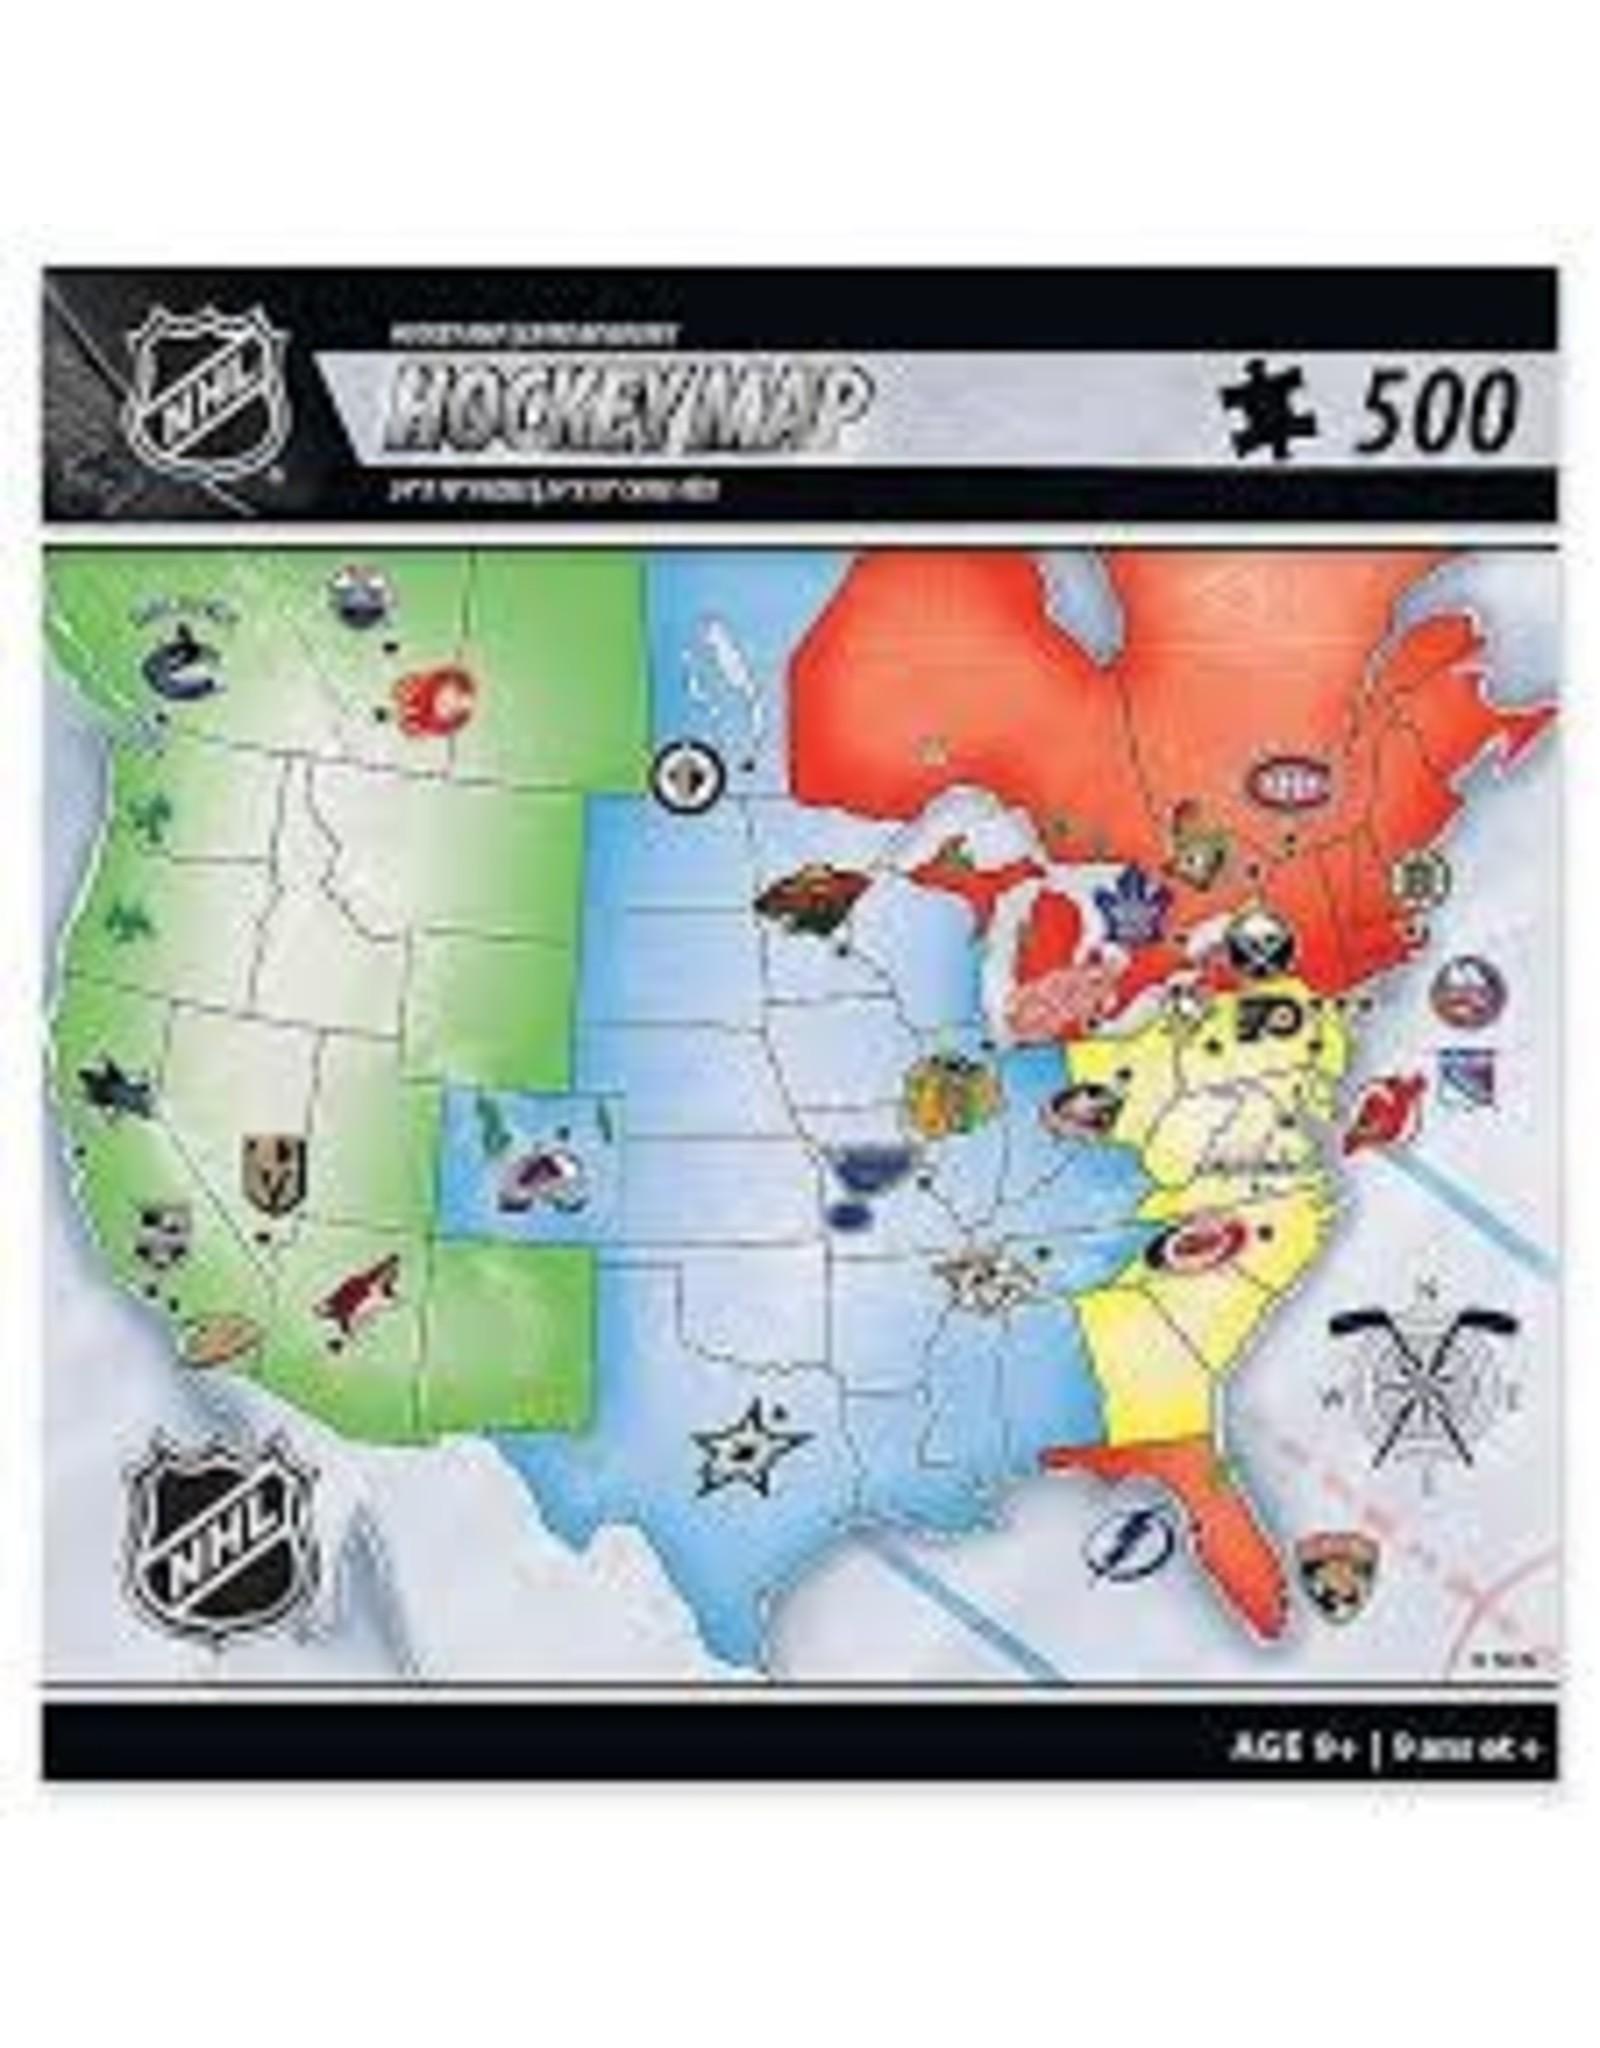 NHL Hockey Map 500